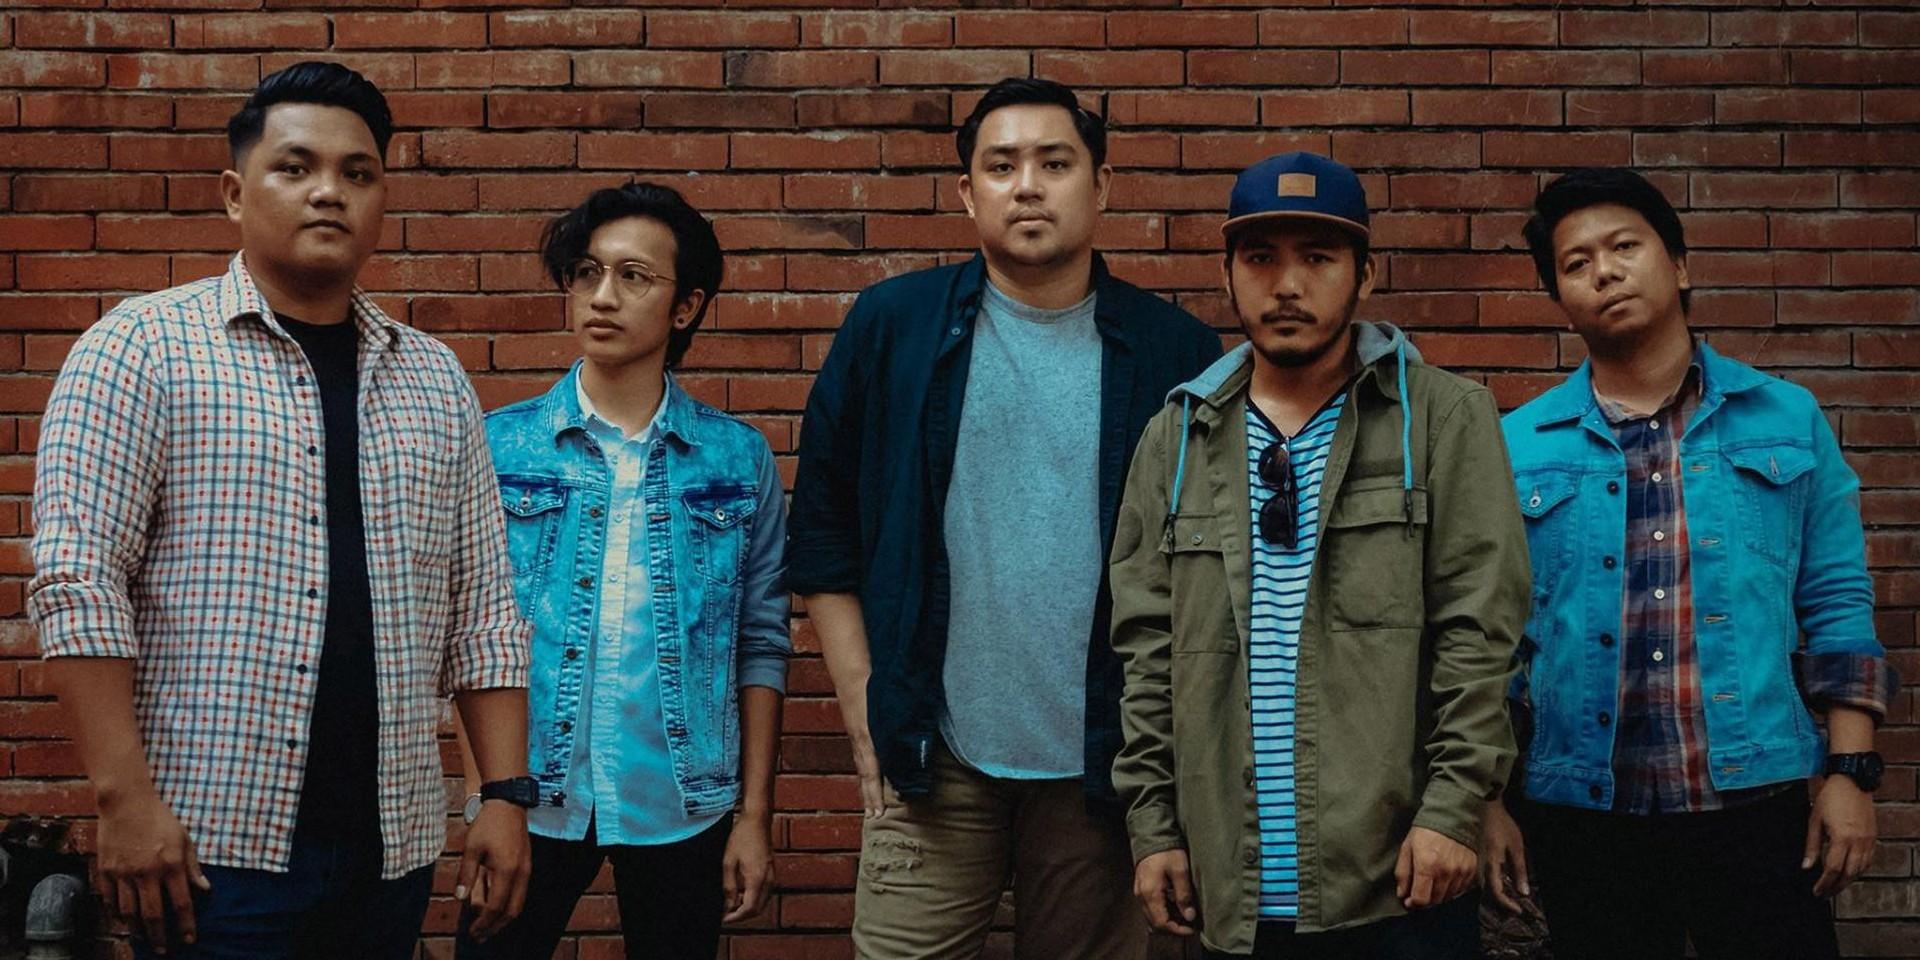 December Avenue close the year with 'Sa Dulo ng WalangHanggan' video, share details for 2019